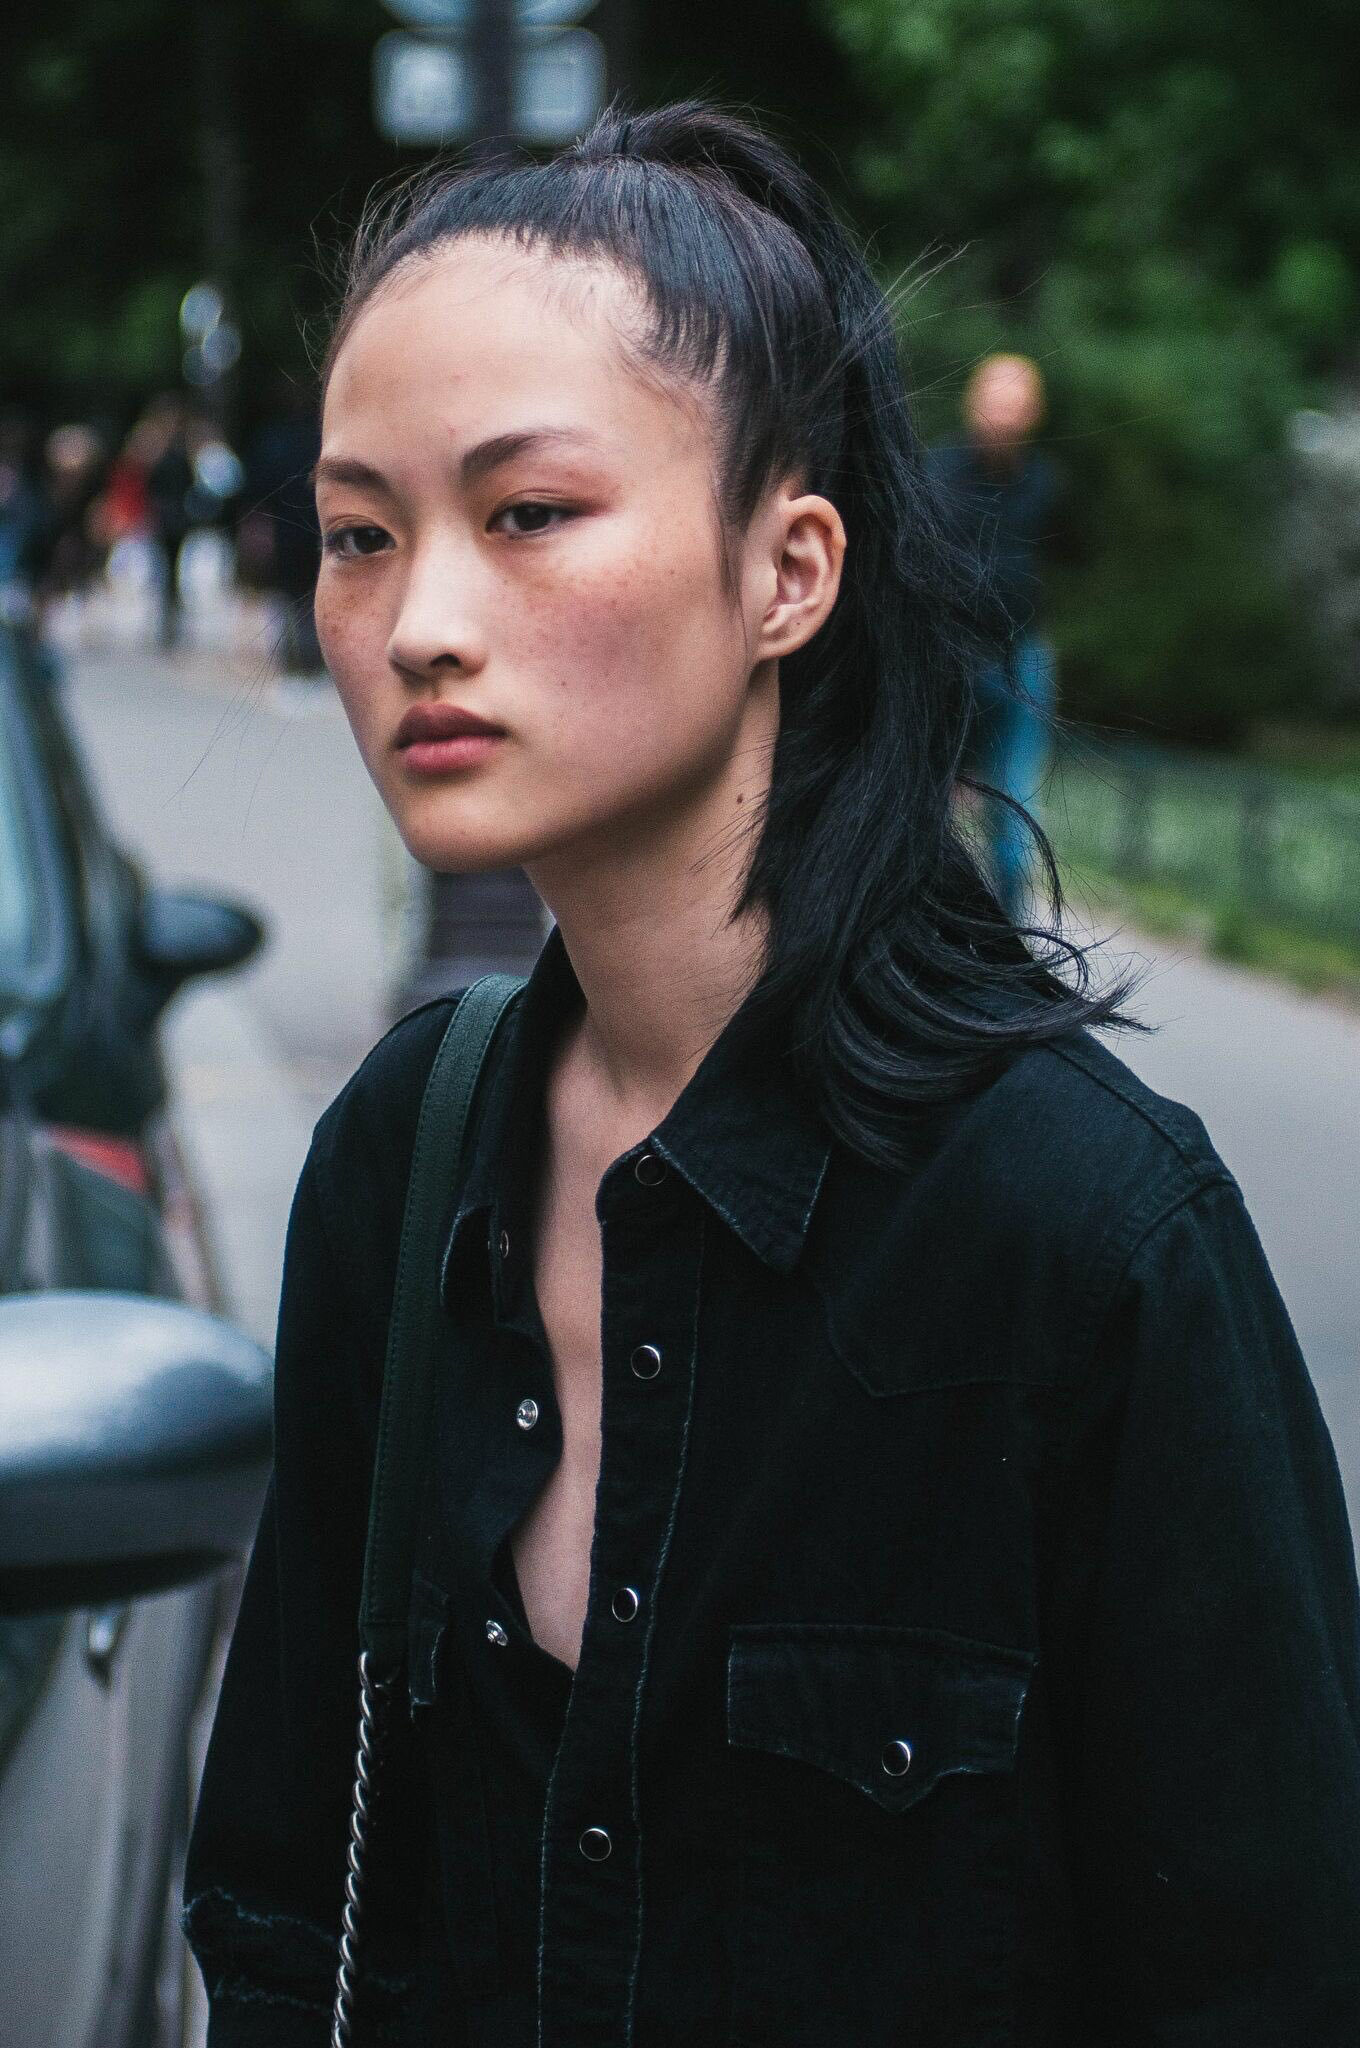 Japanese teen bikini models plesfooggep — 13